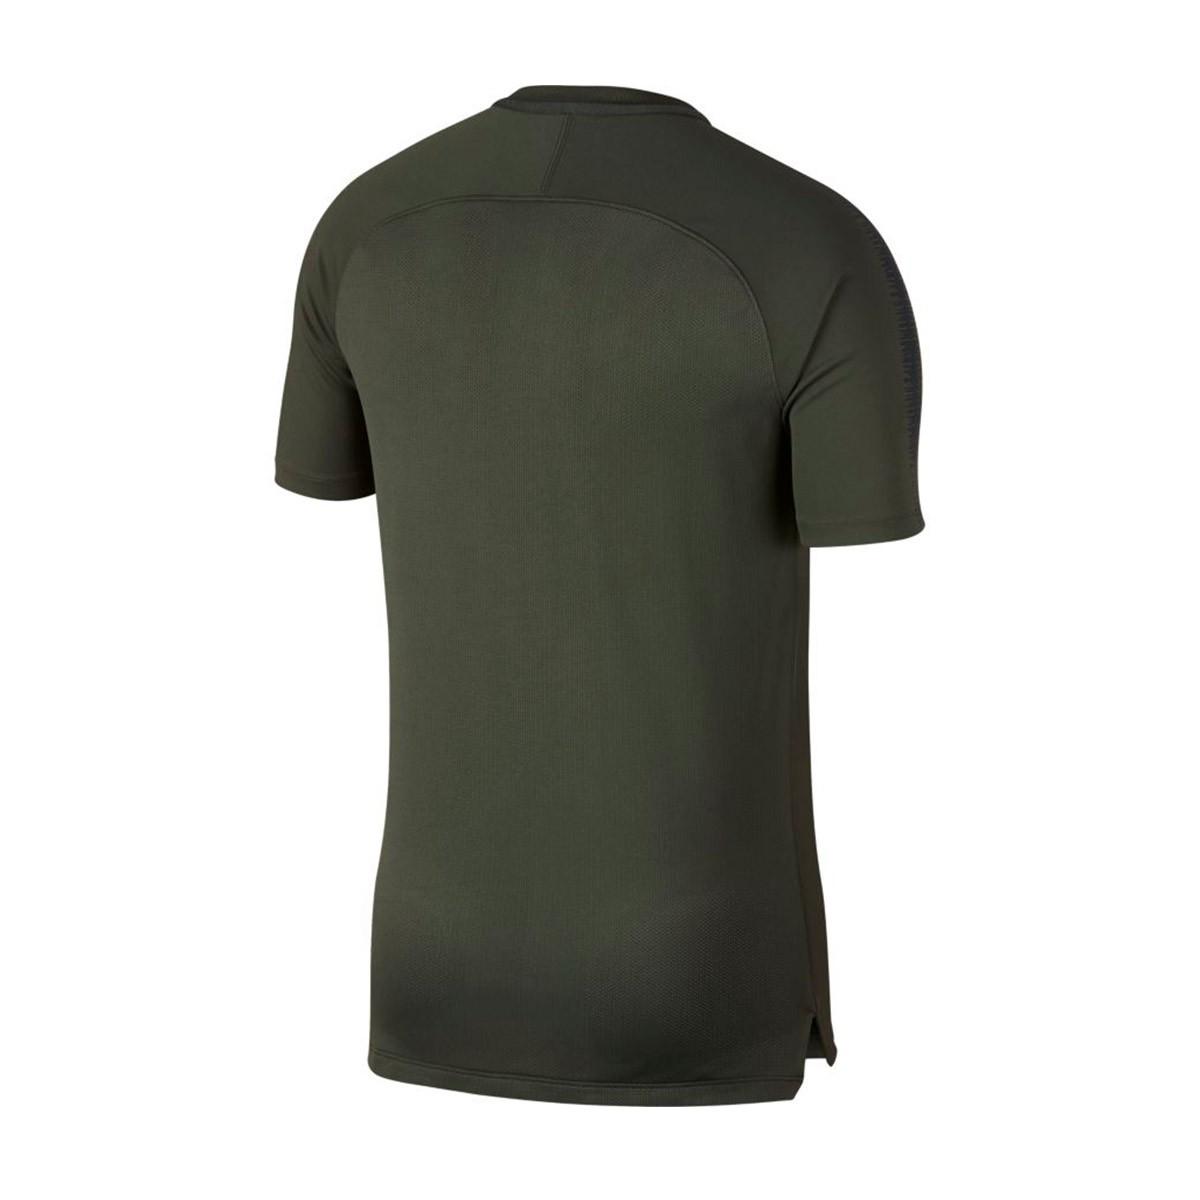 8eeb2dbb20df Jersey Nike Squad Cargo khaki-Black - Tienda de fútbol Fútbol Emotion